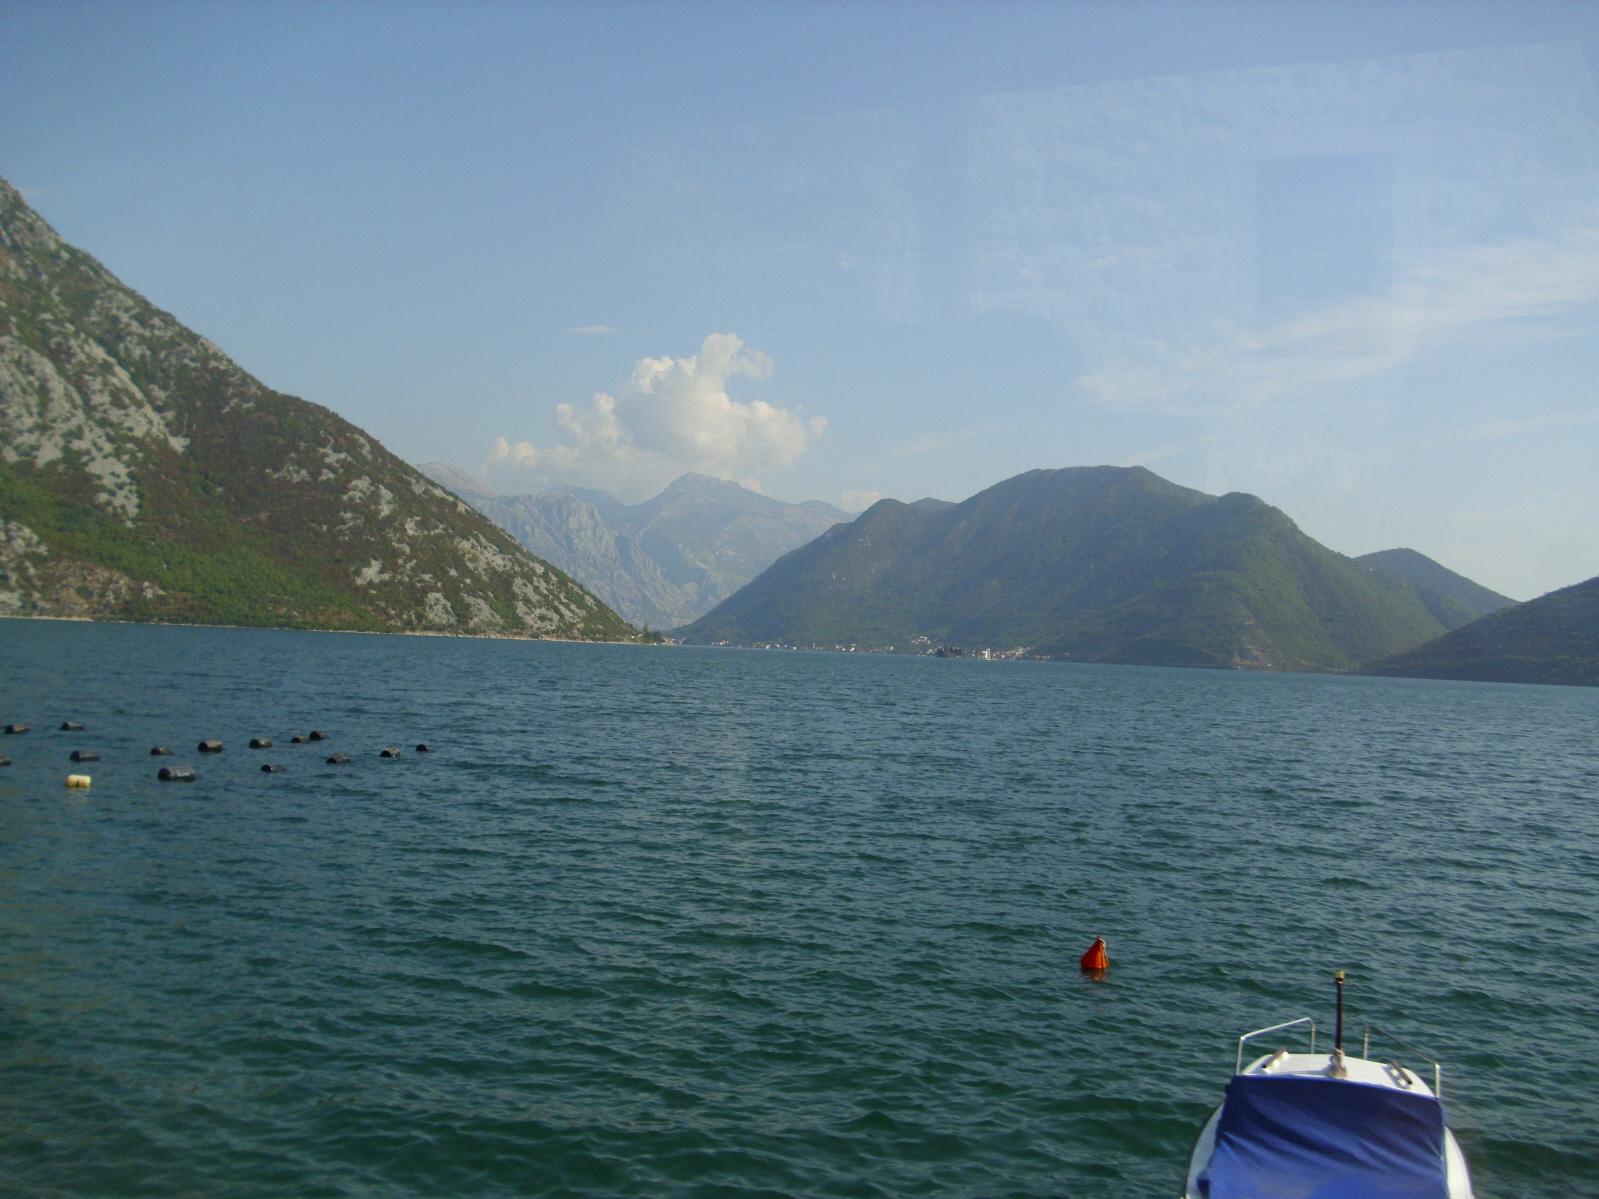 Boka Kotorska. Największa zatoka Adriatyku